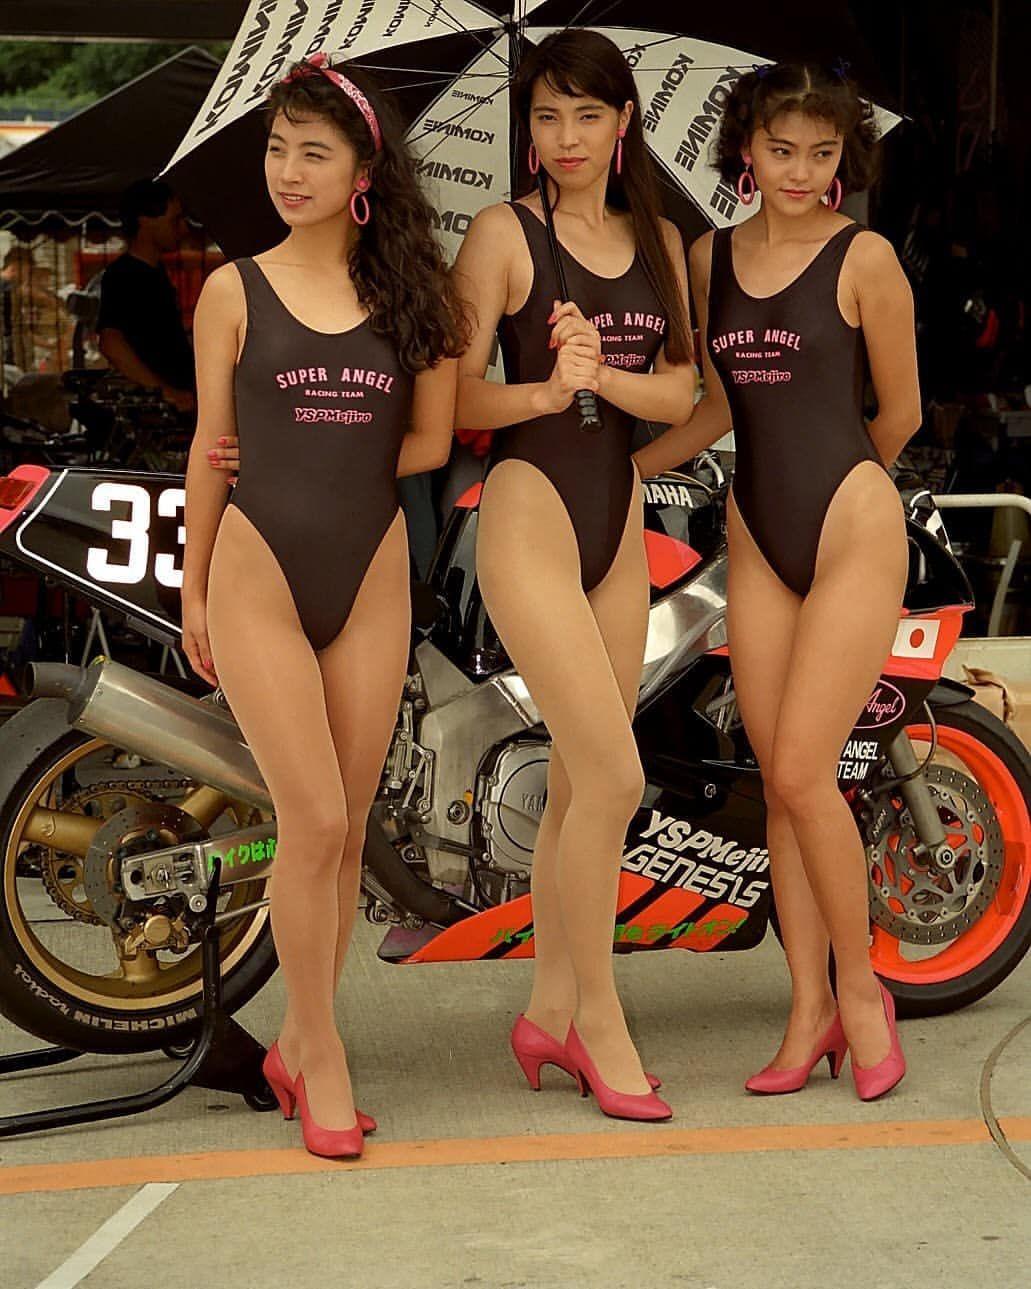 Racers girls naked pics xxx